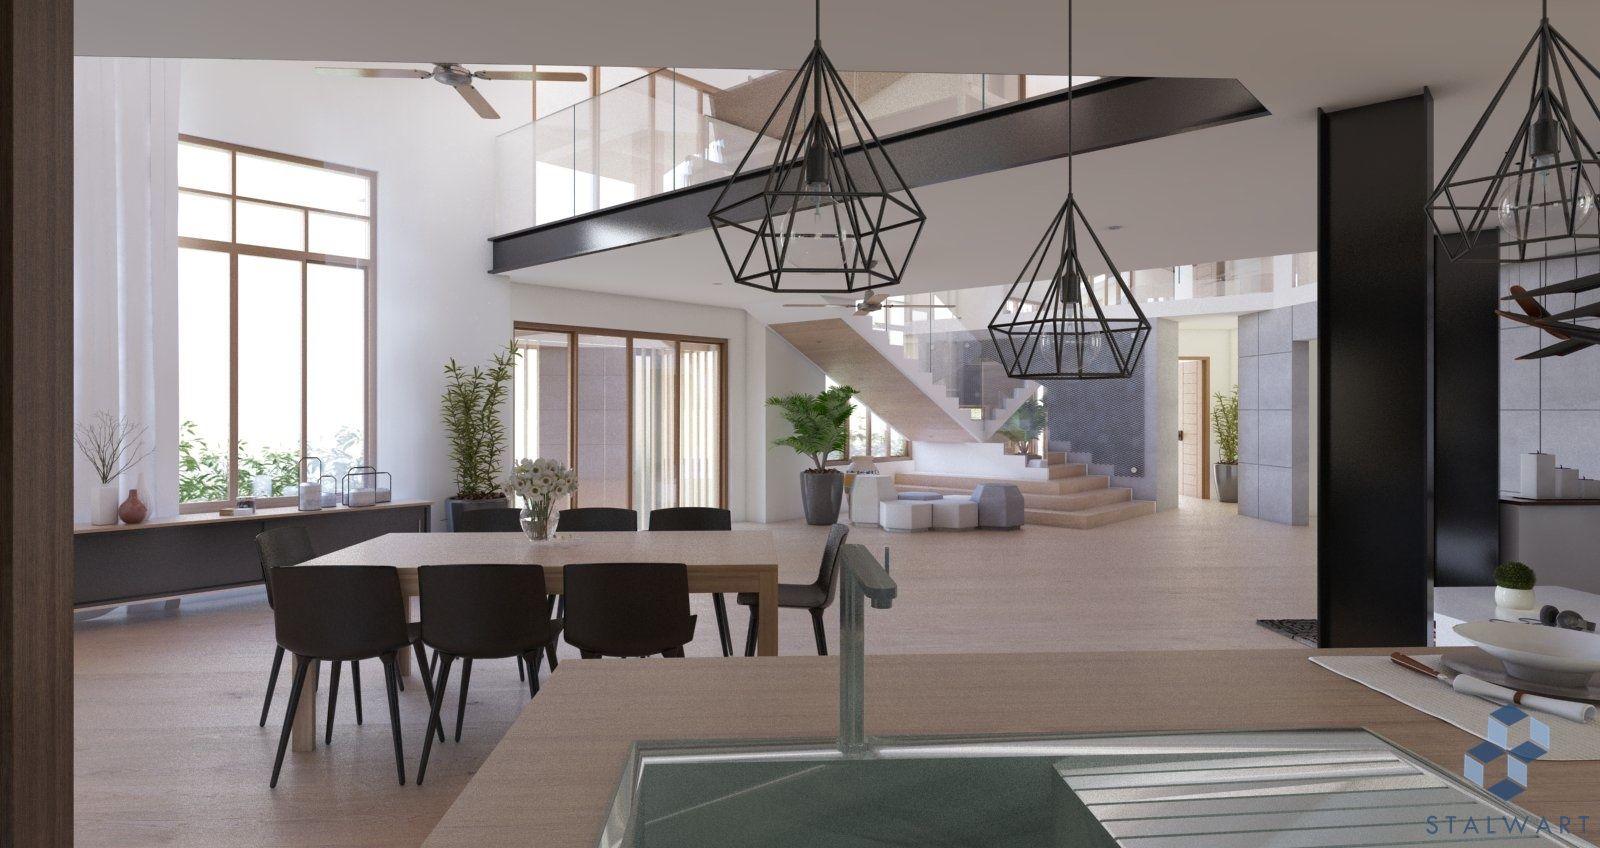 dining and kitchen area interior design inspirations interior rh pinterest com